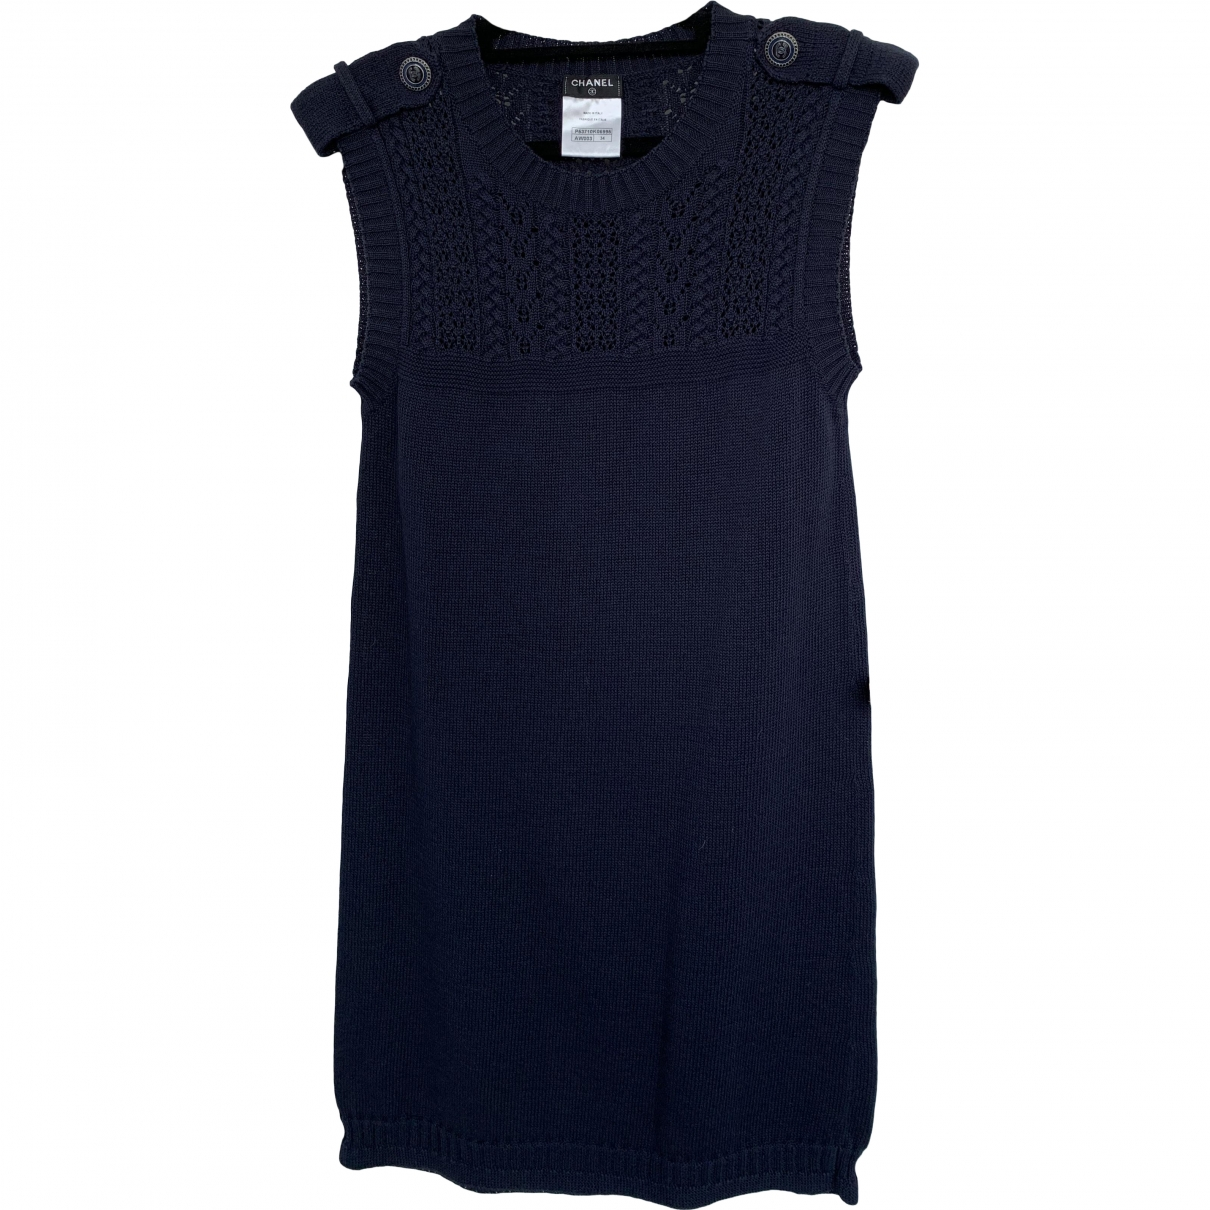 Chanel \N Navy Cotton dress for Women 34 FR